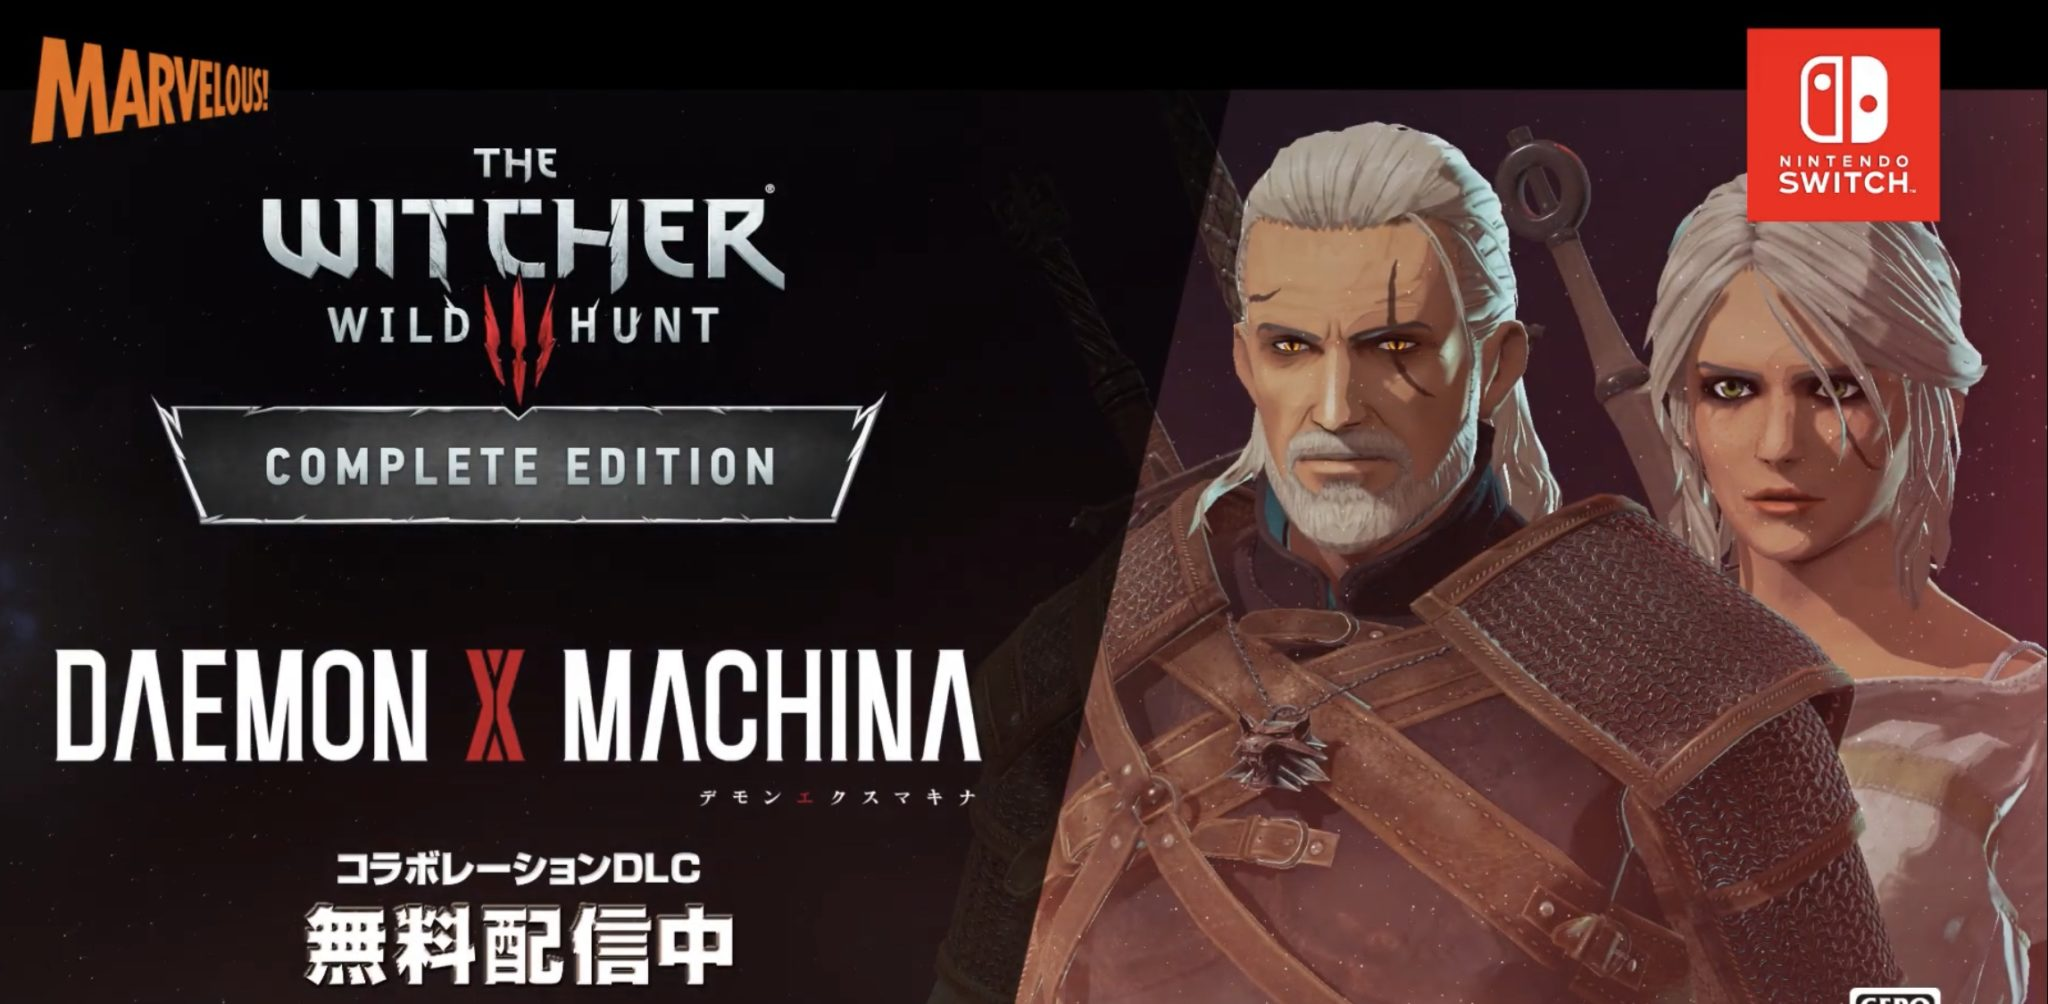 Geralt i Ciri jako skórki, Minecraft króluje, State of Play od Sony – Tech-Game Newsroom (09.12-15.12)